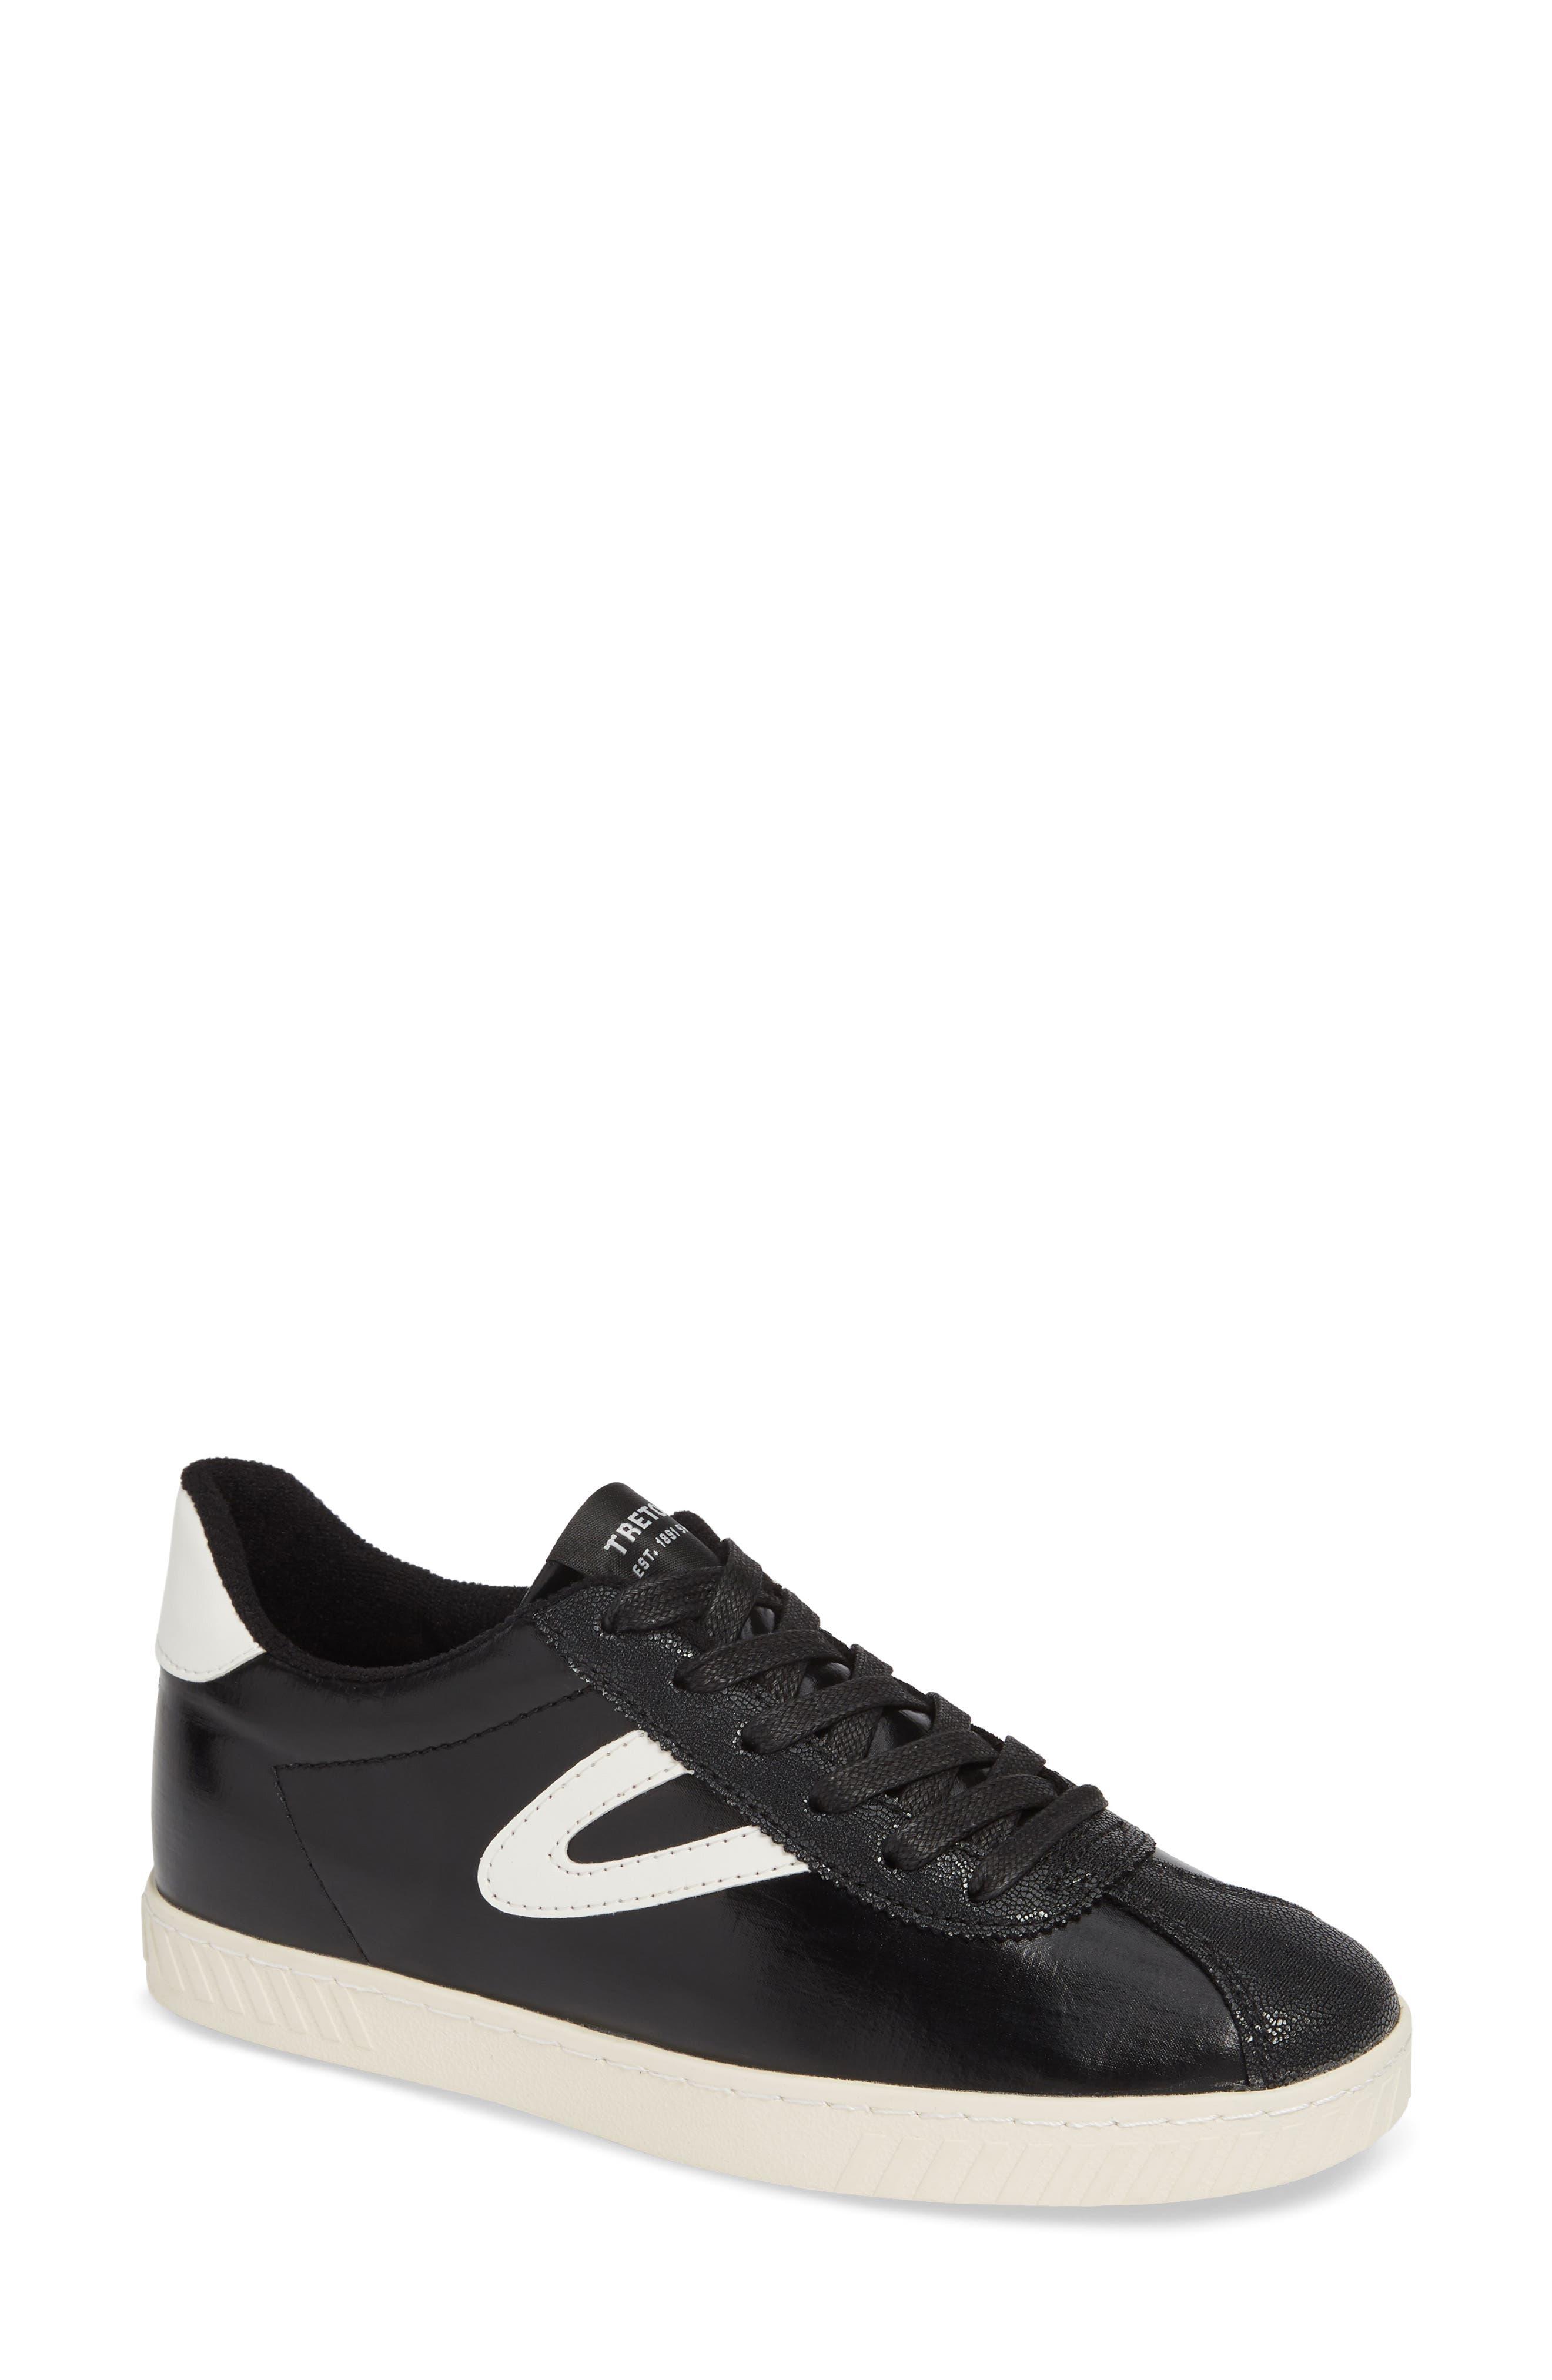 Callie 5 Sneaker, Main, color, BLACK/ VINTAGE WHITE FABRIC